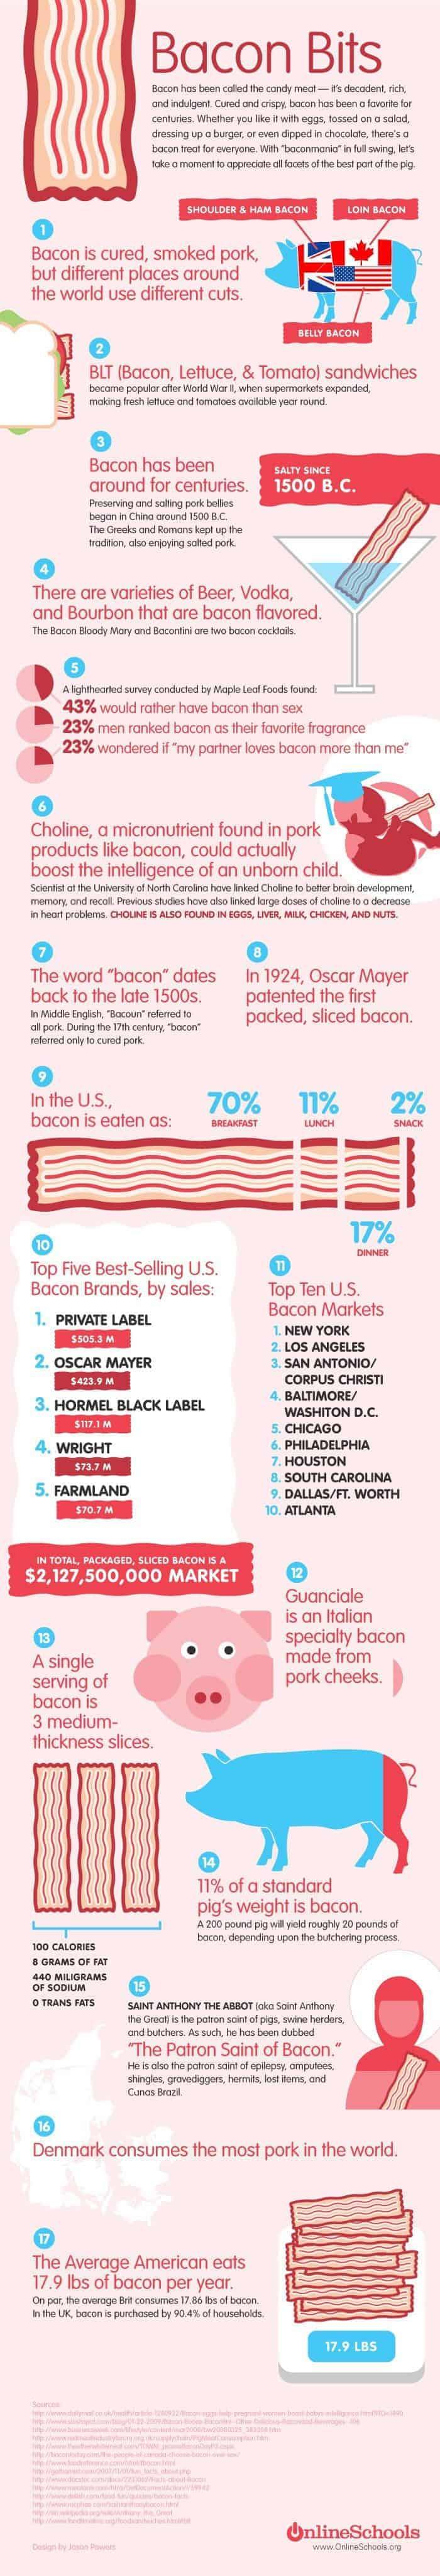 17 Tasty Tips on Bacon